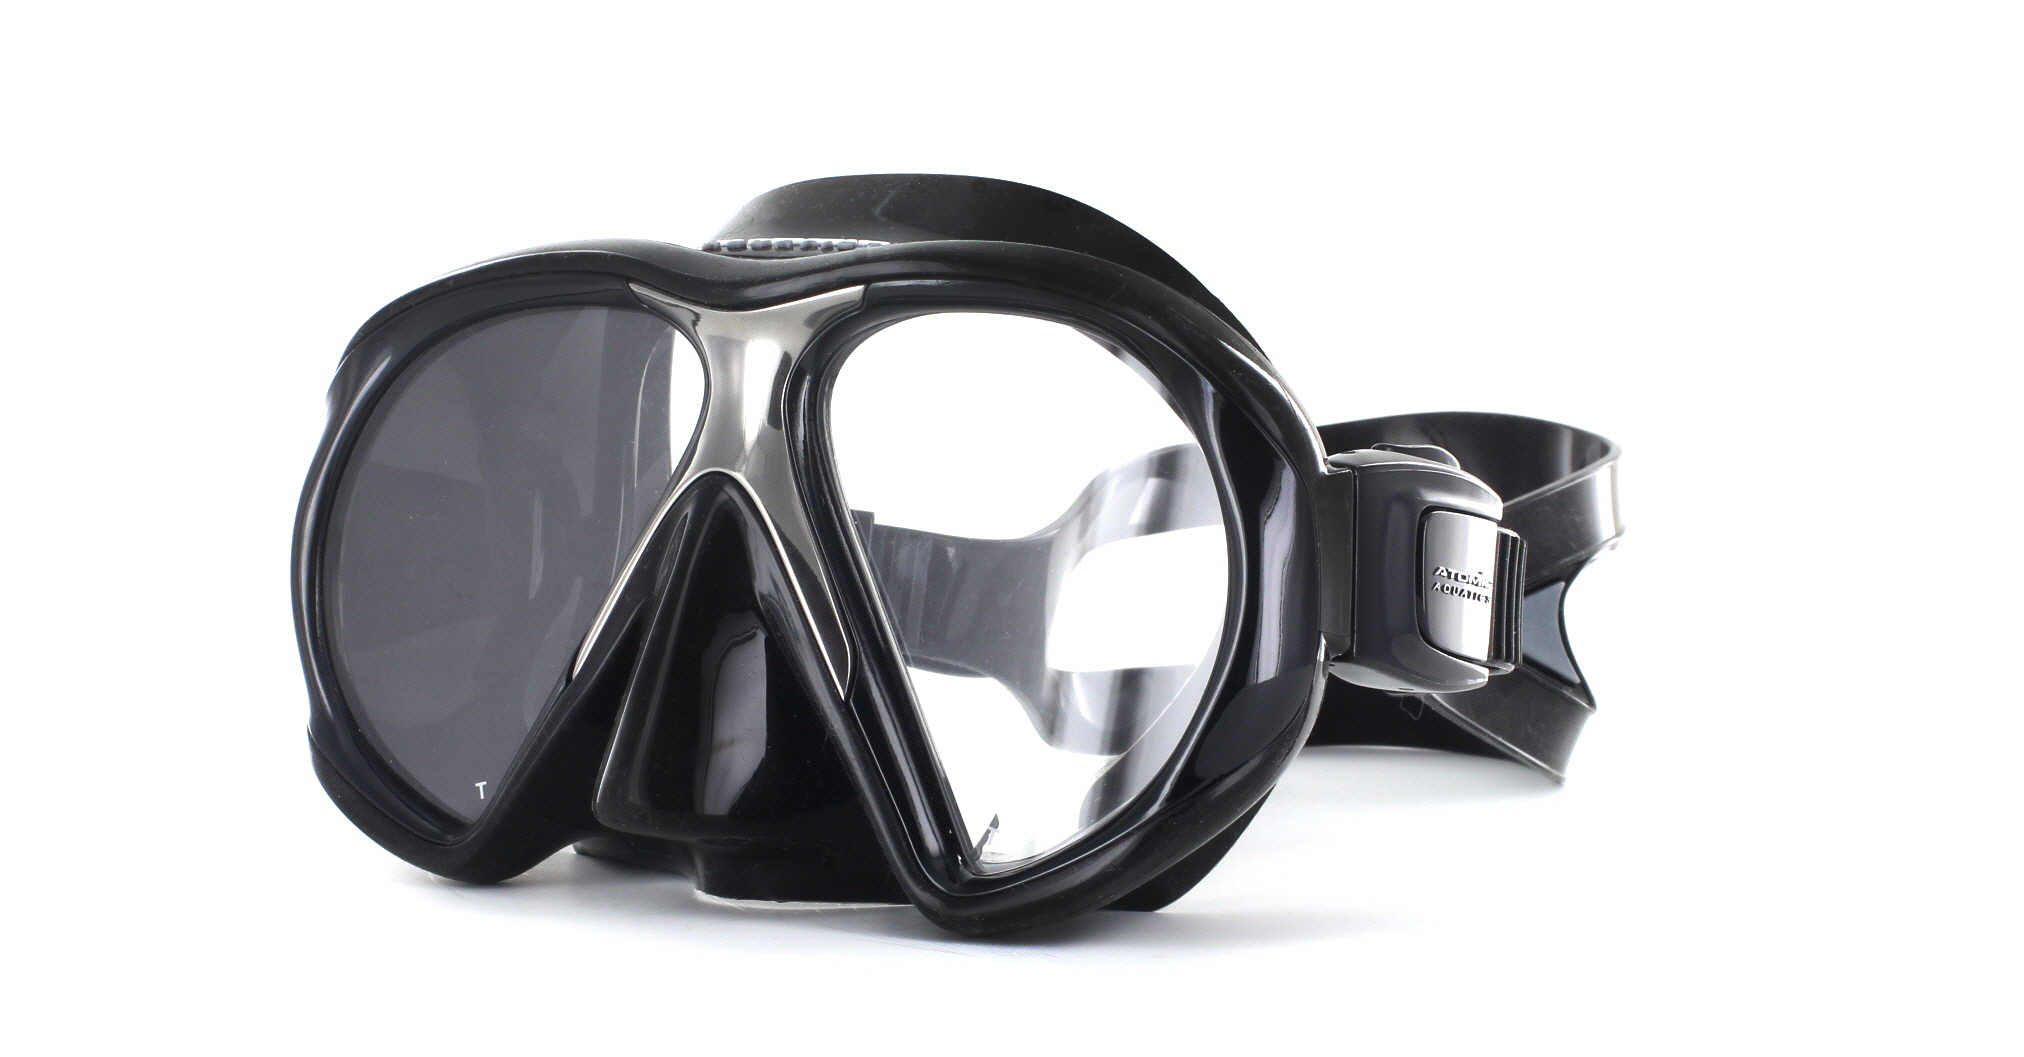 Atomic Aquatics SubFrame Black Silicon - Black Schräge Ansicht